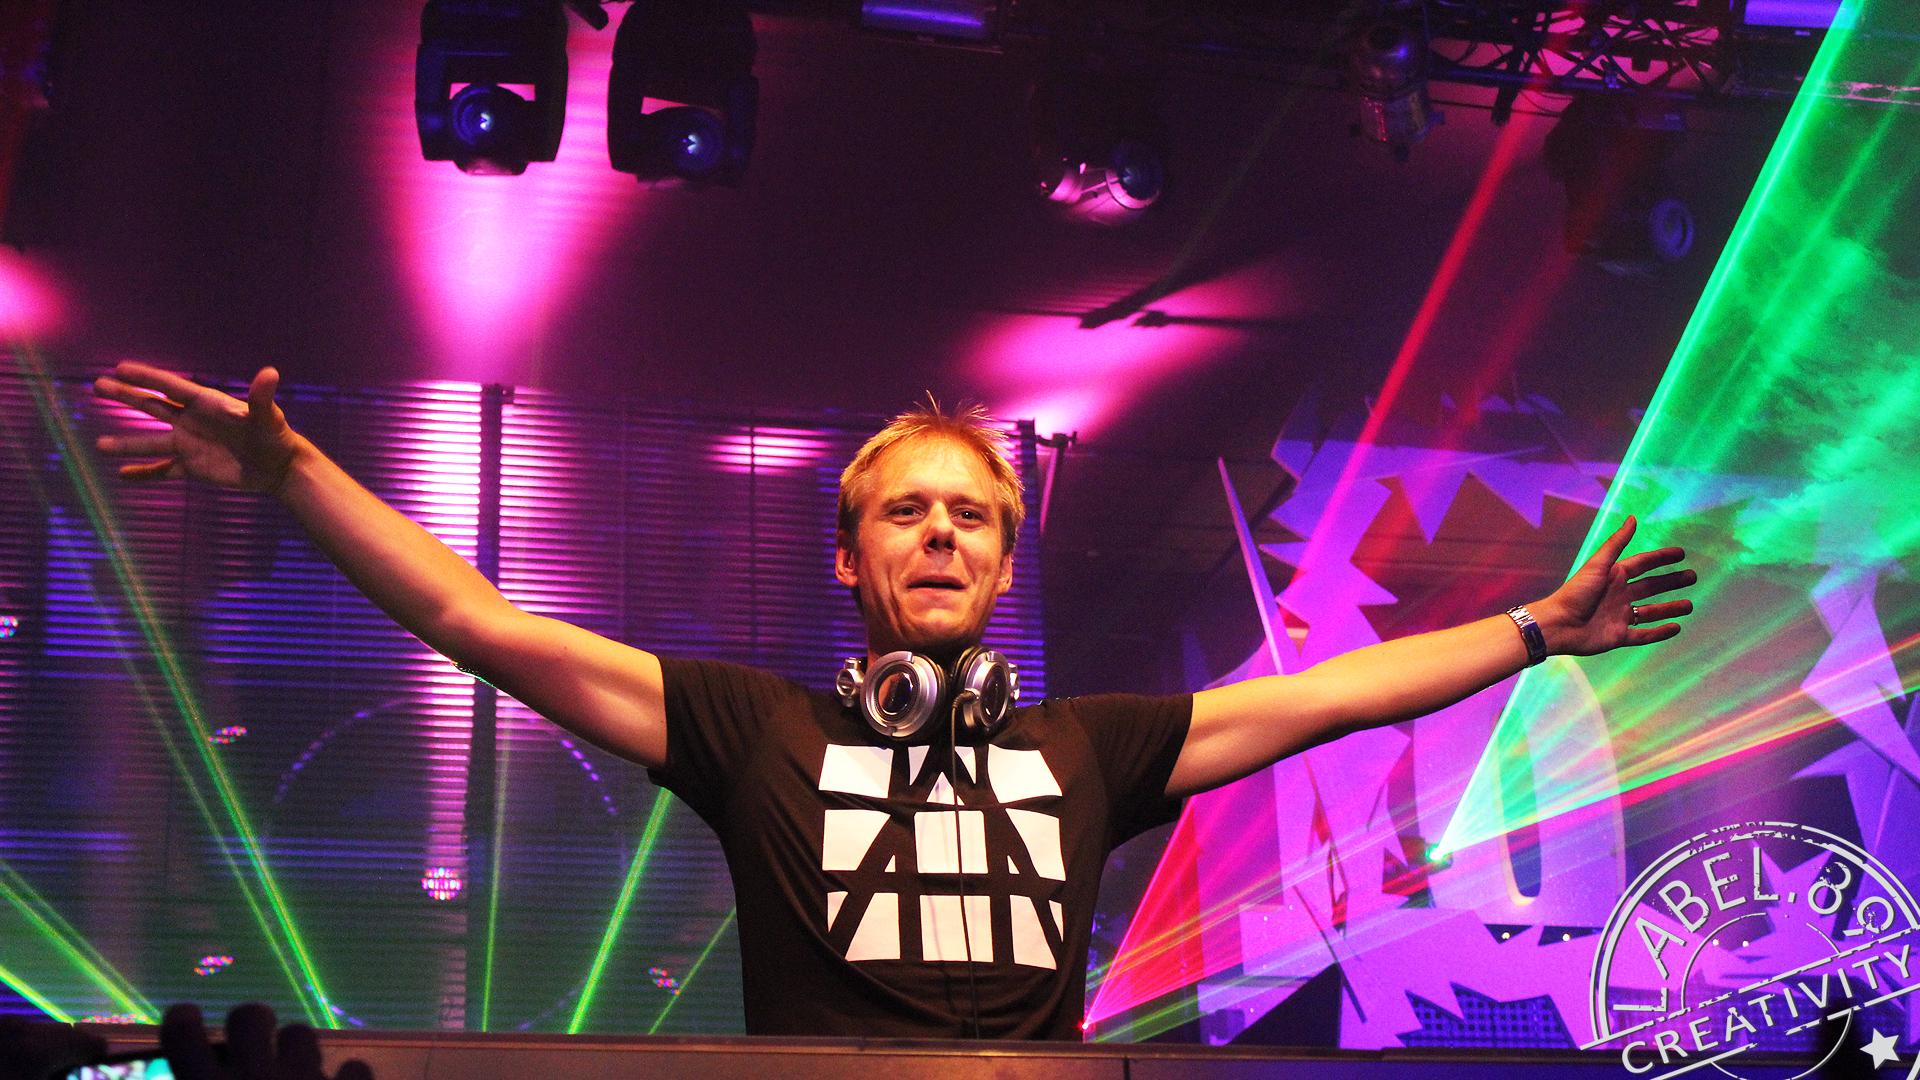 Armin van Buuren does the official remix for Game of ThronesGeeks & Cleats